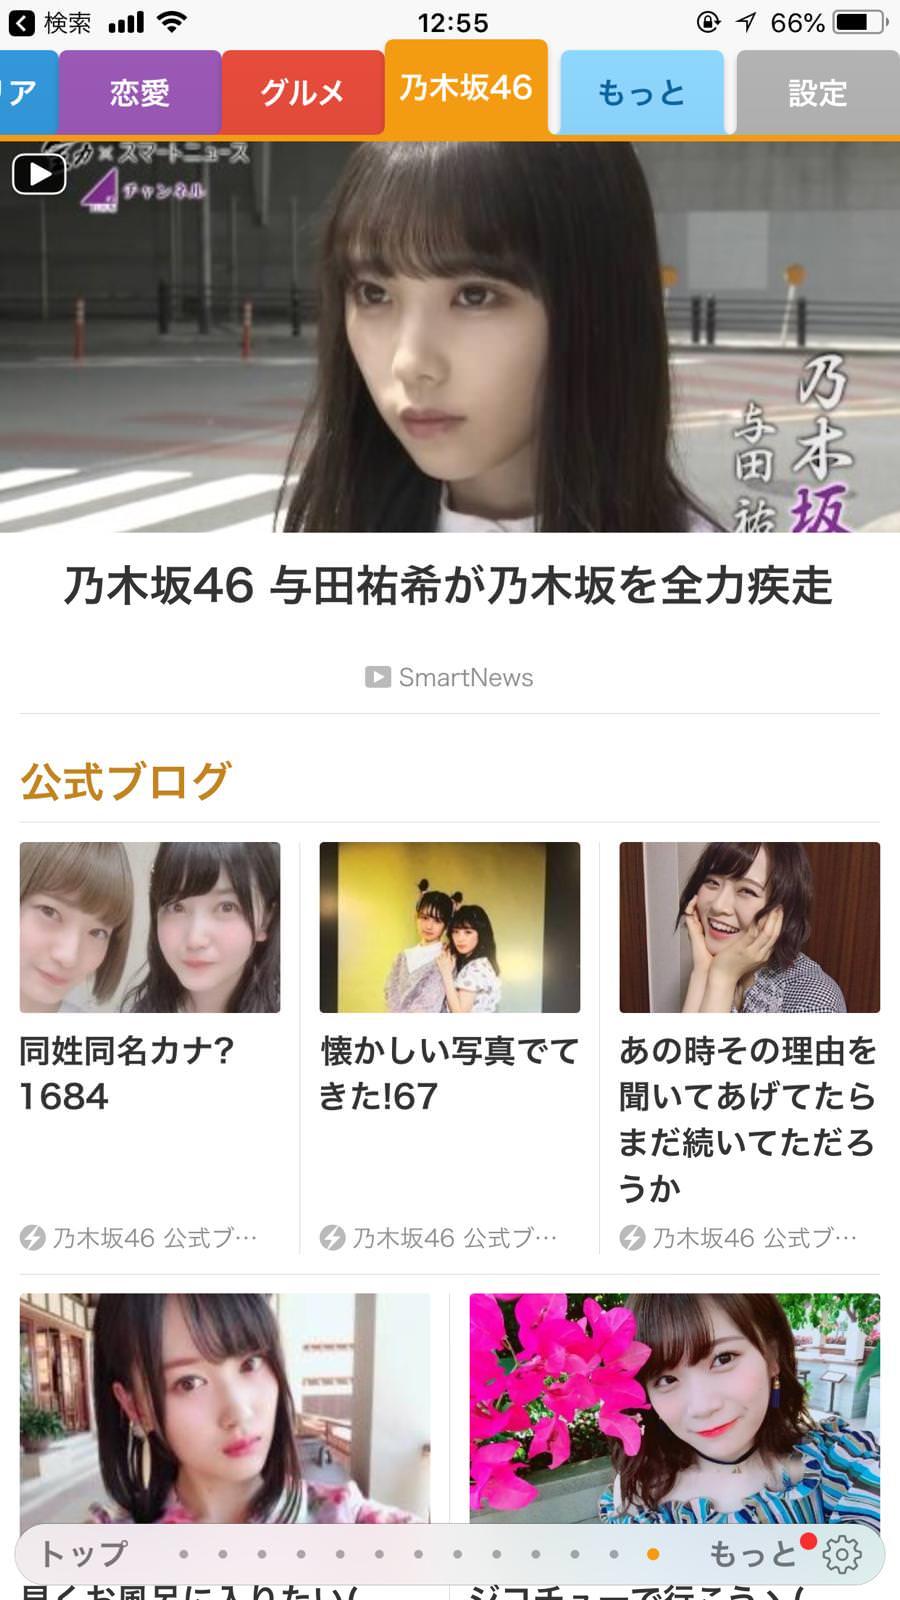 SmartNews 乃木坂46与田祐希が乃木坂を全力疾走